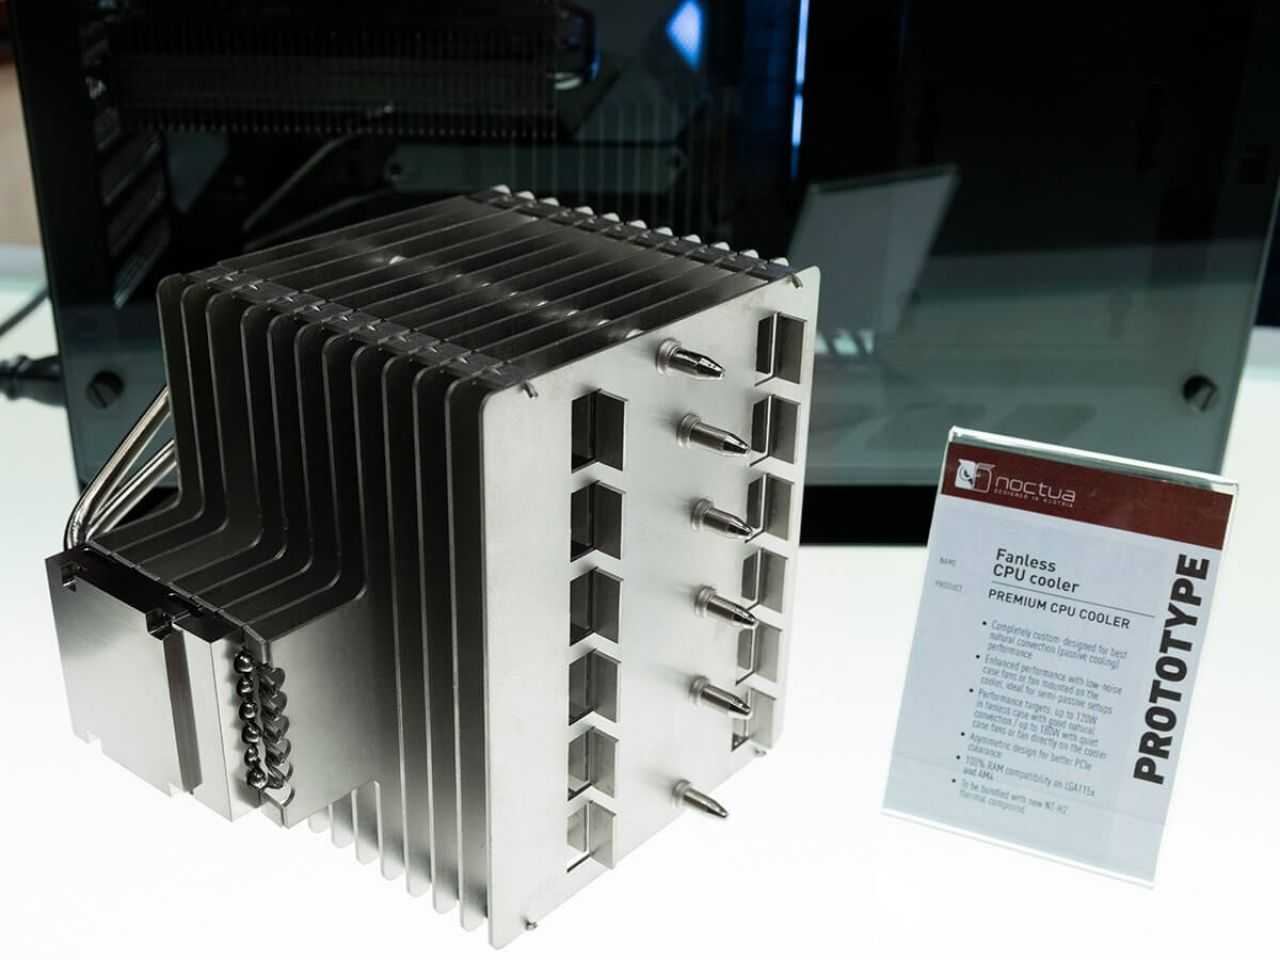 Noctua: the LGA 1700 Socket CPU kit available soon